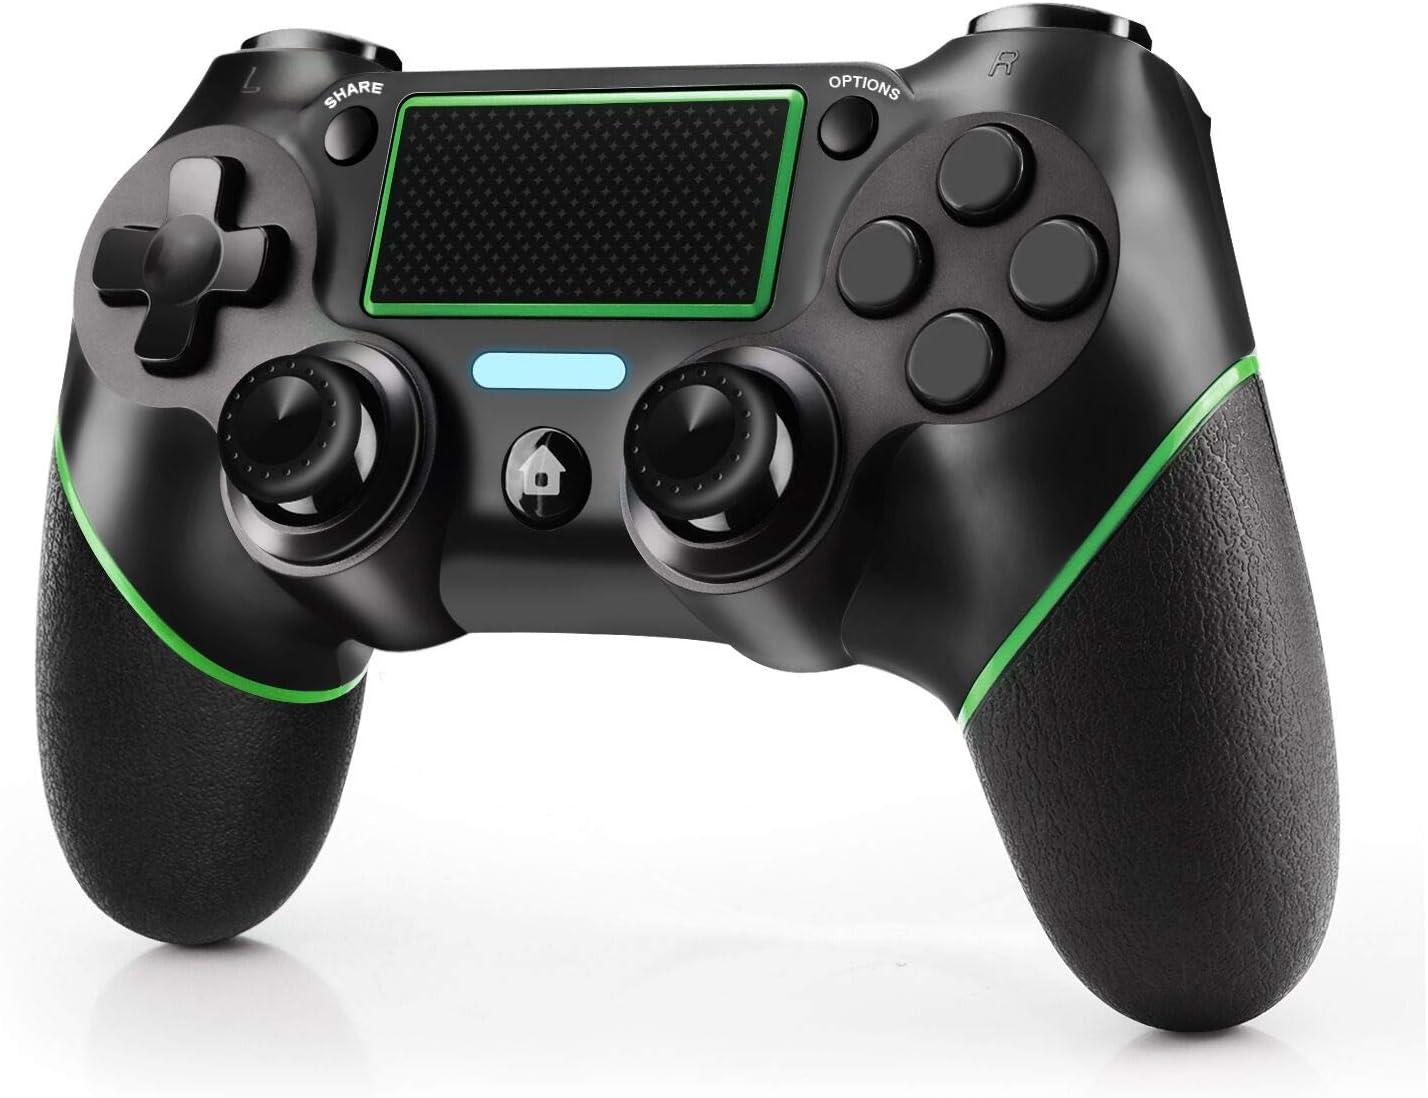 JAMSWALL Mando para PS4, Inalámbrico Controlador para Playstation 4 Wireless Controller Bluetooth Gamepad Joystick con Vibración Doble Jack de Audio de Seis Ejes